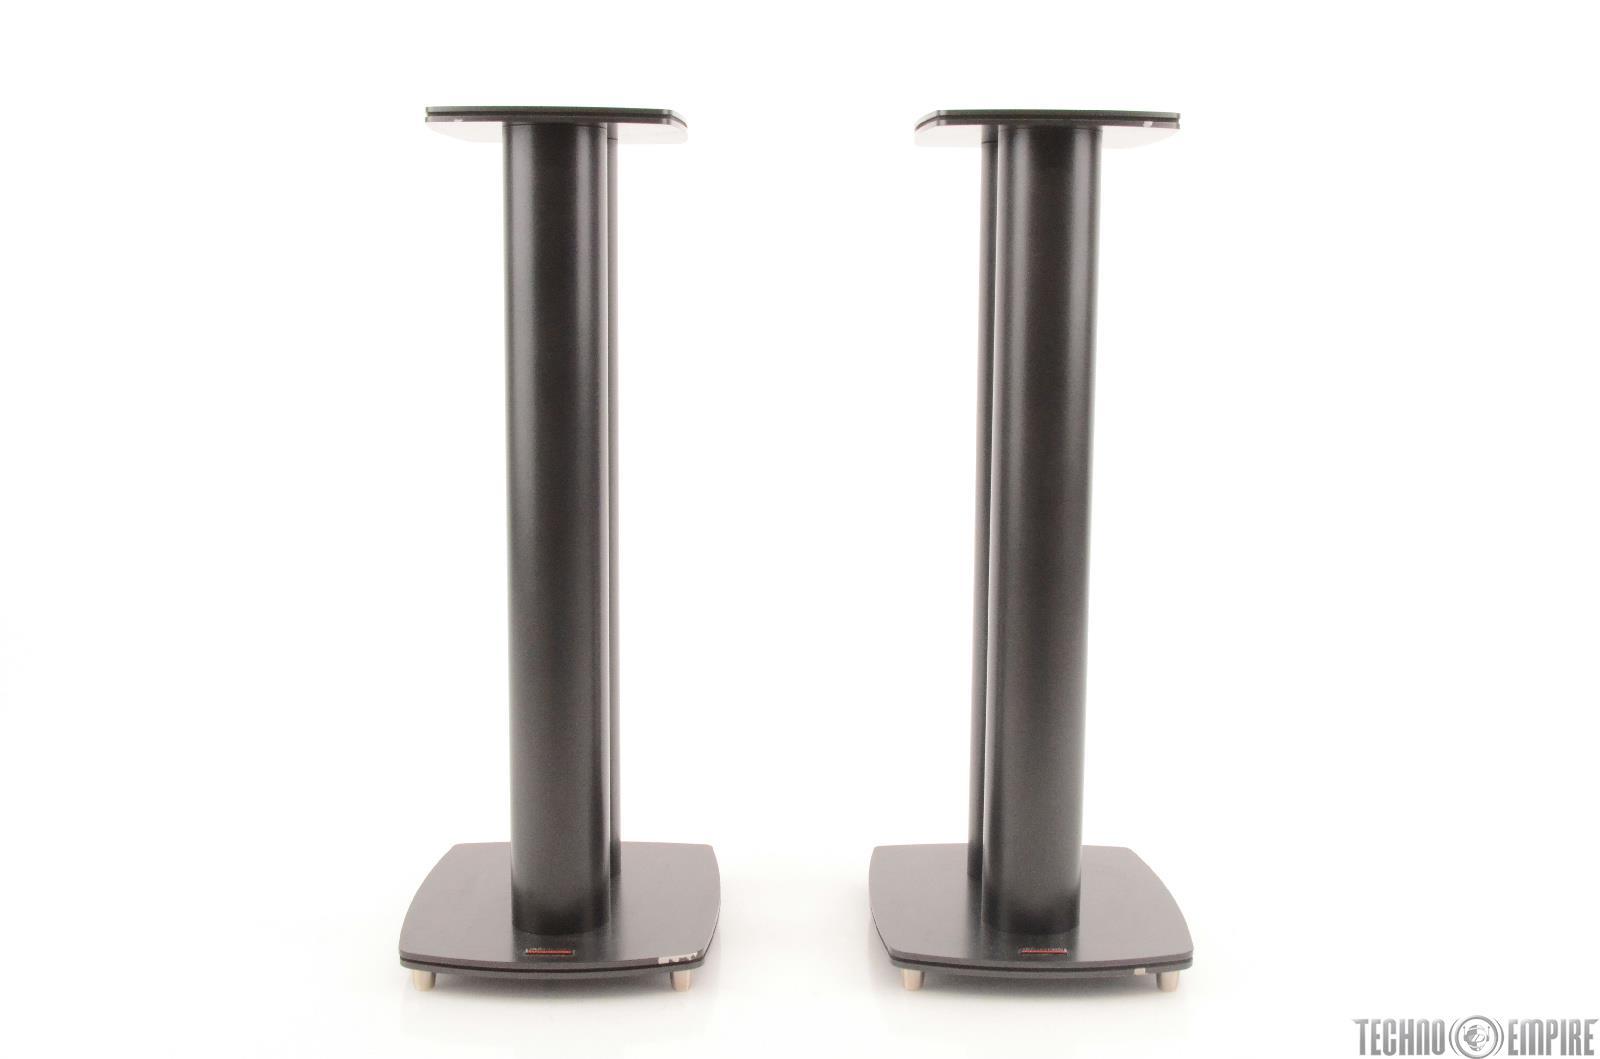 dynaudio stand 4 hi fi studio monitor speaker stands pair 24356 ebay. Black Bedroom Furniture Sets. Home Design Ideas